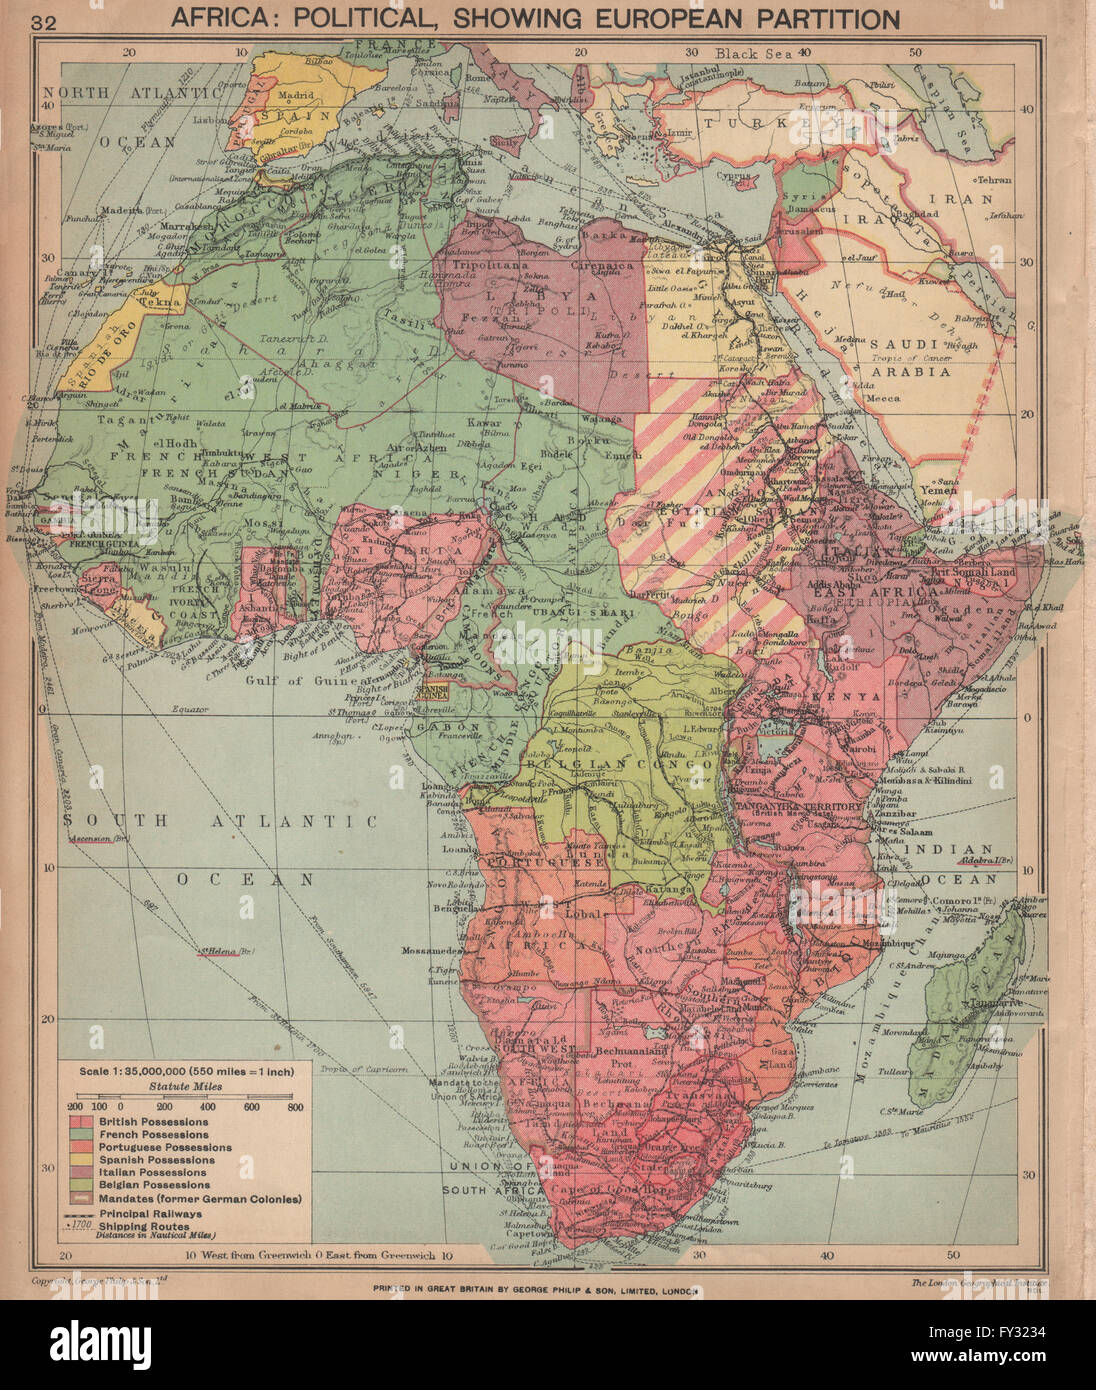 Karte Afrika Kolonien.Zweiten Weltkrieg Afrika Zeigt Europaische Kolonien